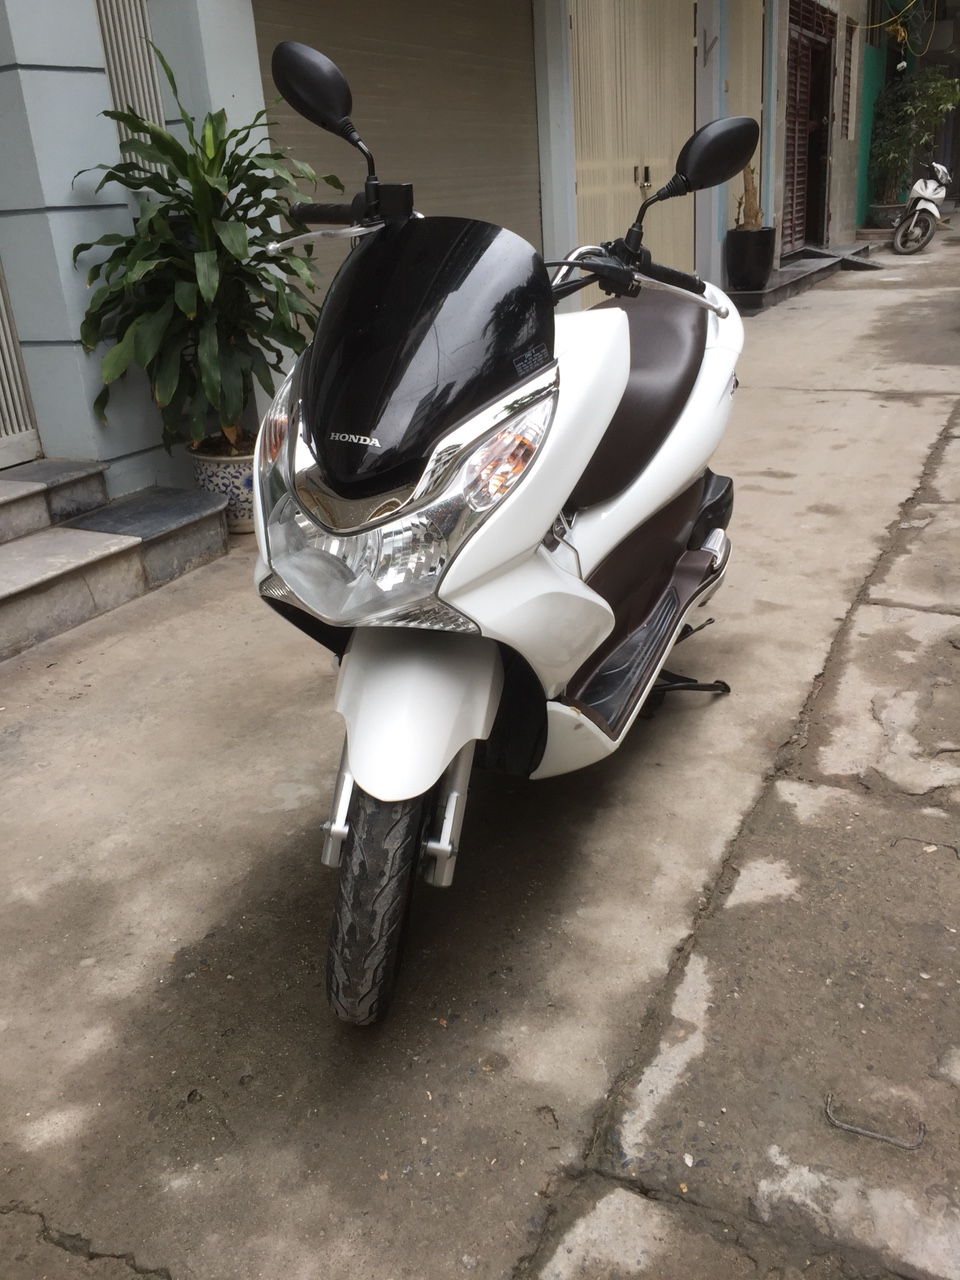 Can ban Honda PCX Fi 2011 trang bien HN 29B5 so chinh chu su dung 28tr500 - 5